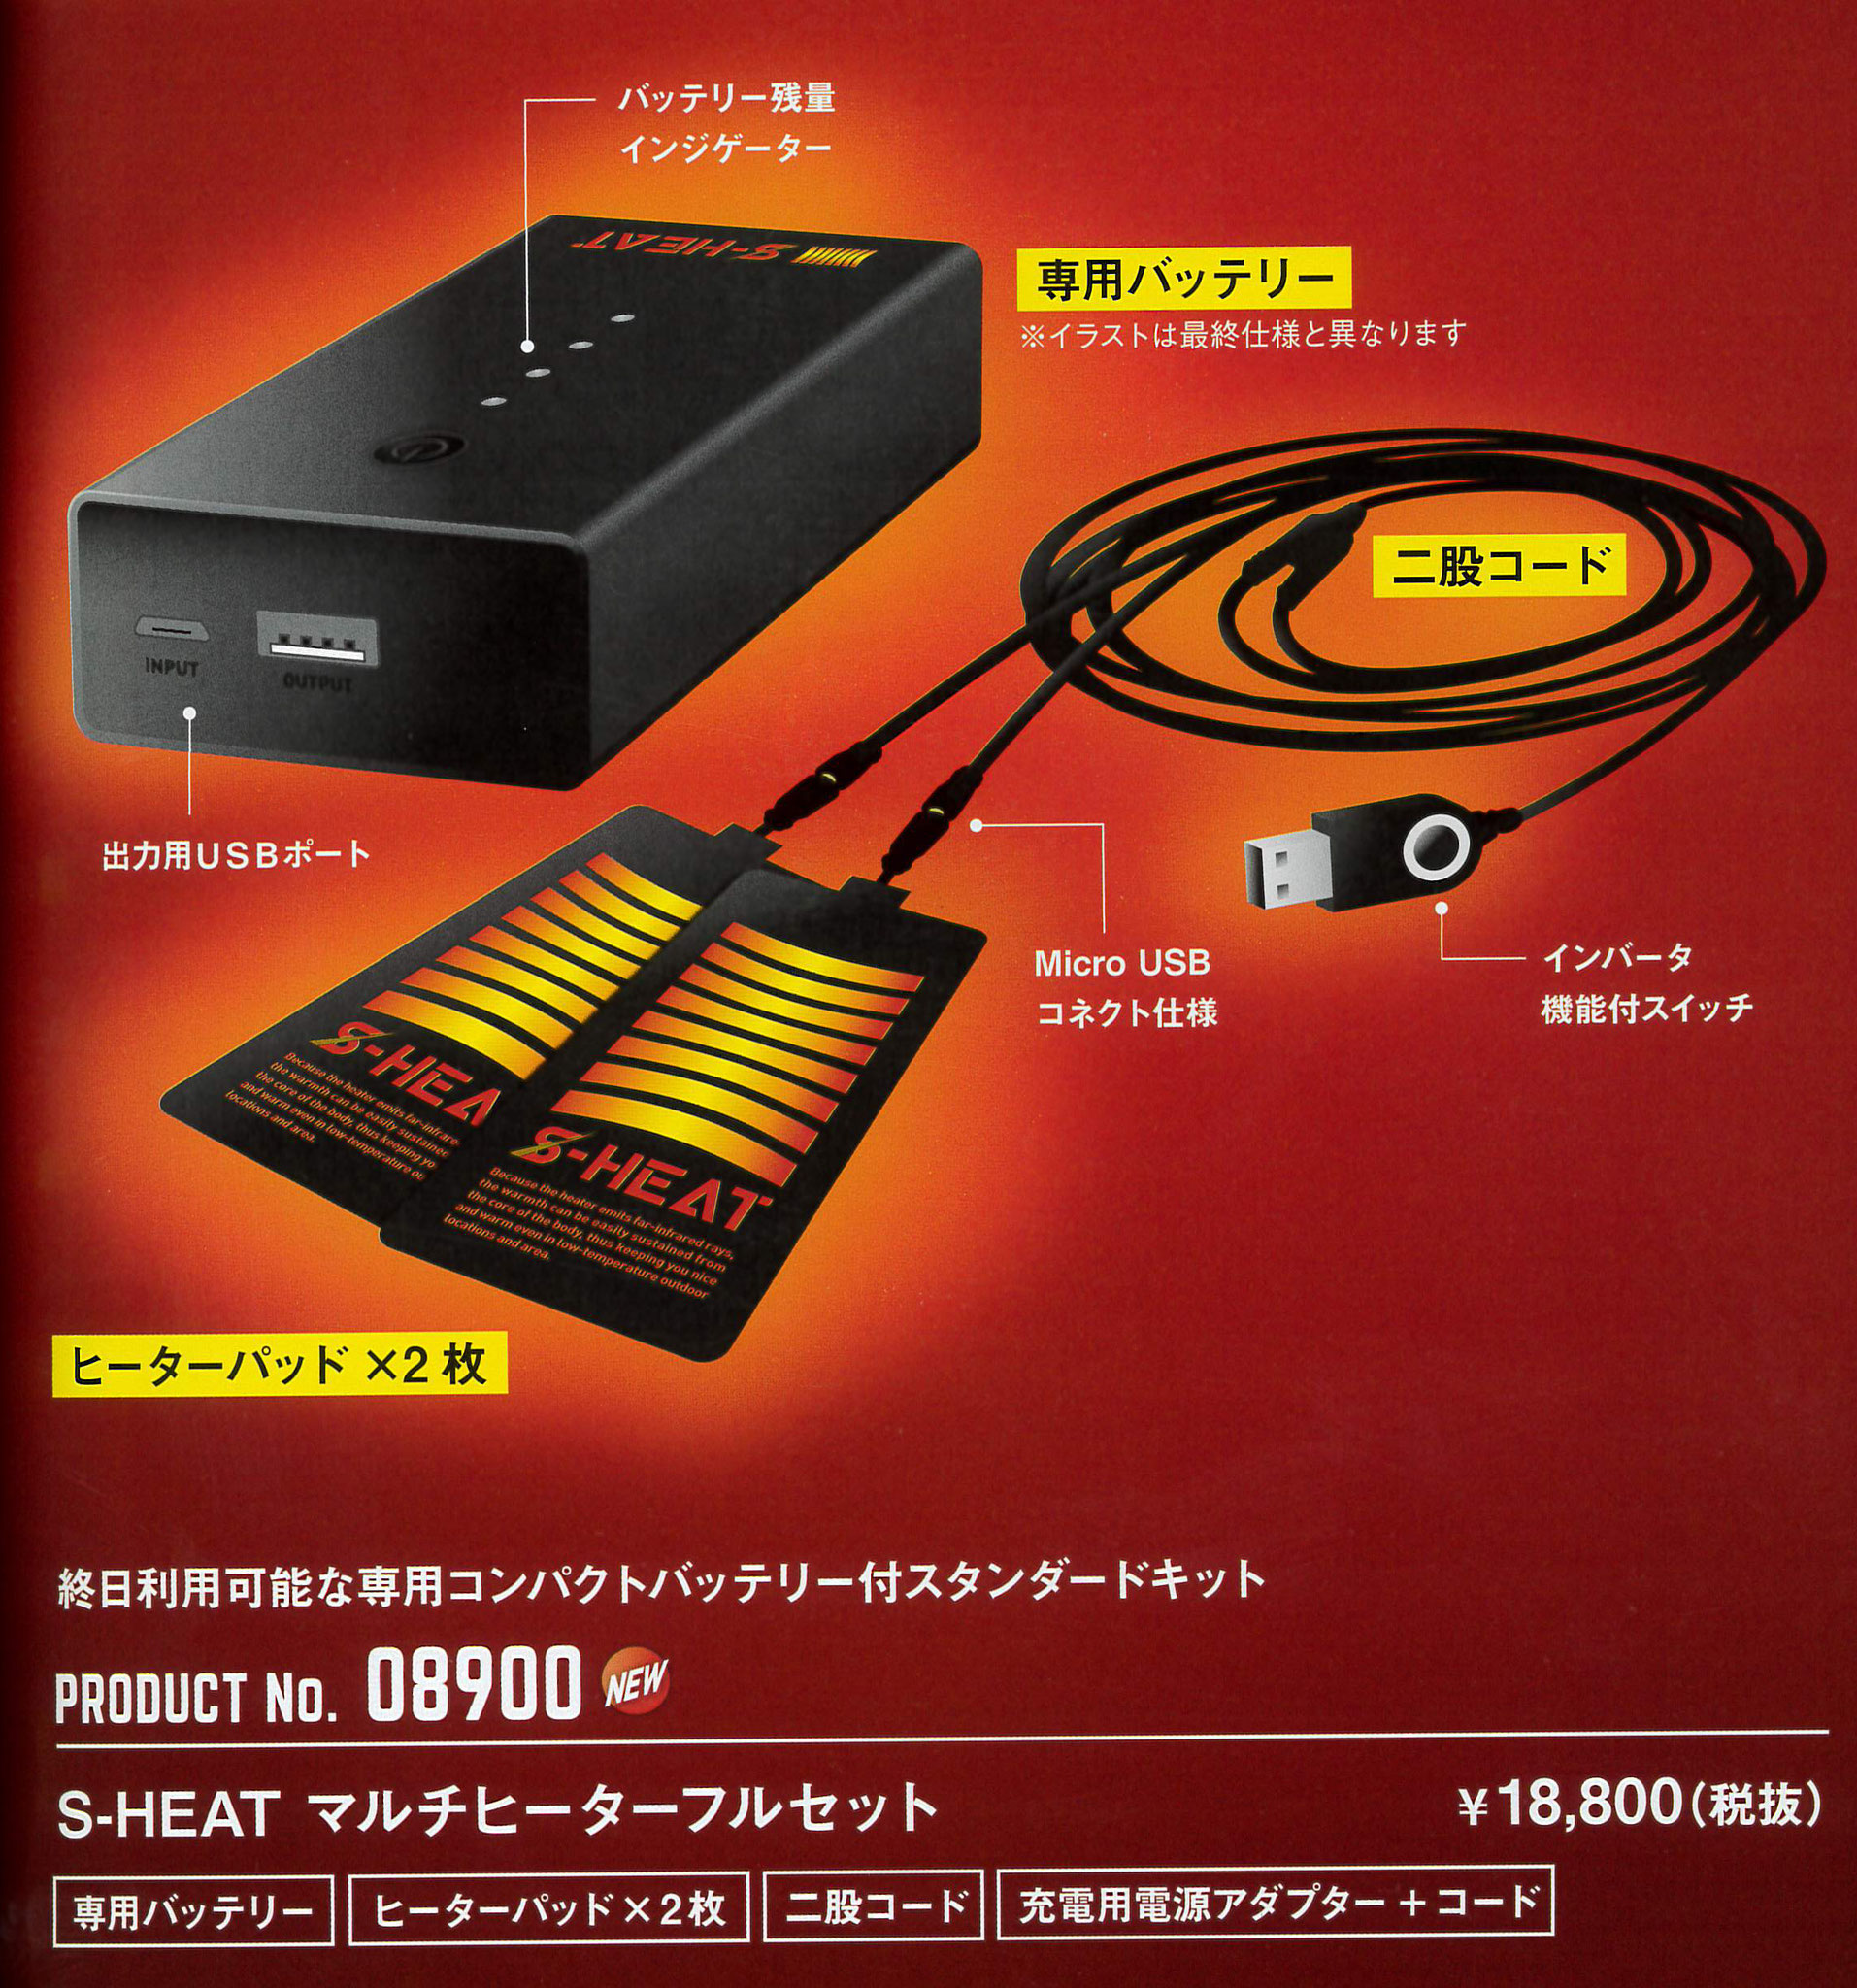 S-HEAT~エス・ヒート~暖房機器 08900シリーズ。10秒で暖かさを実感